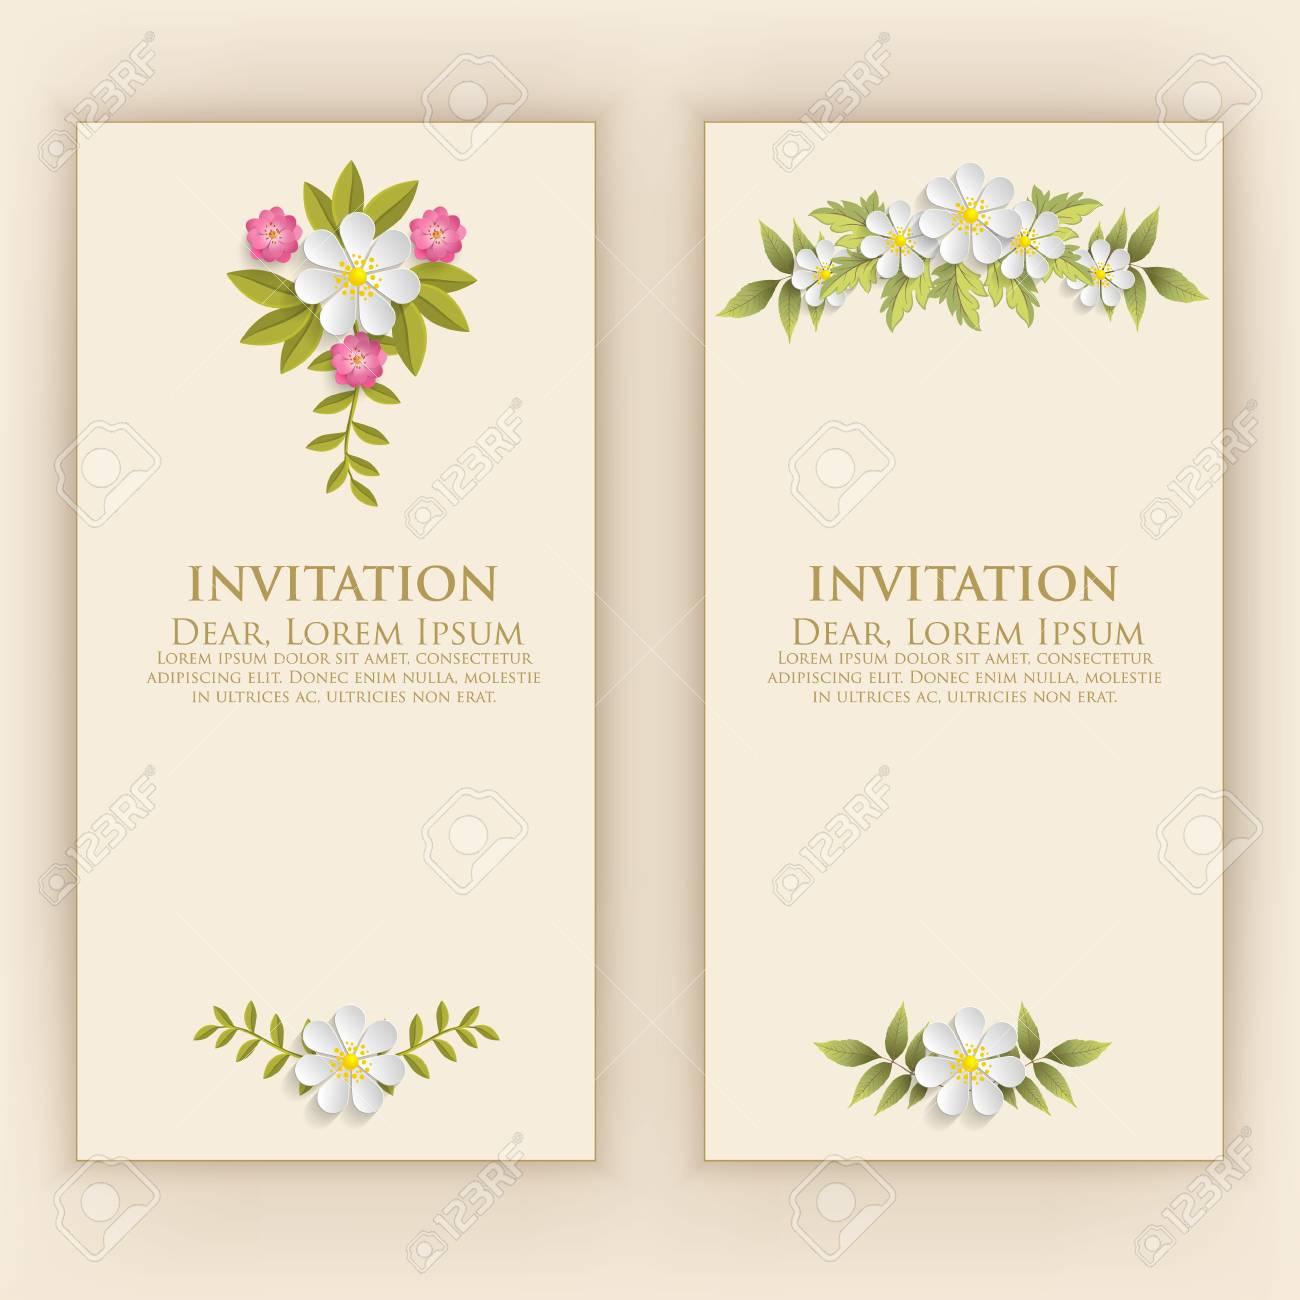 Wedding Invitation Card Vector Invitation Card With Elegant